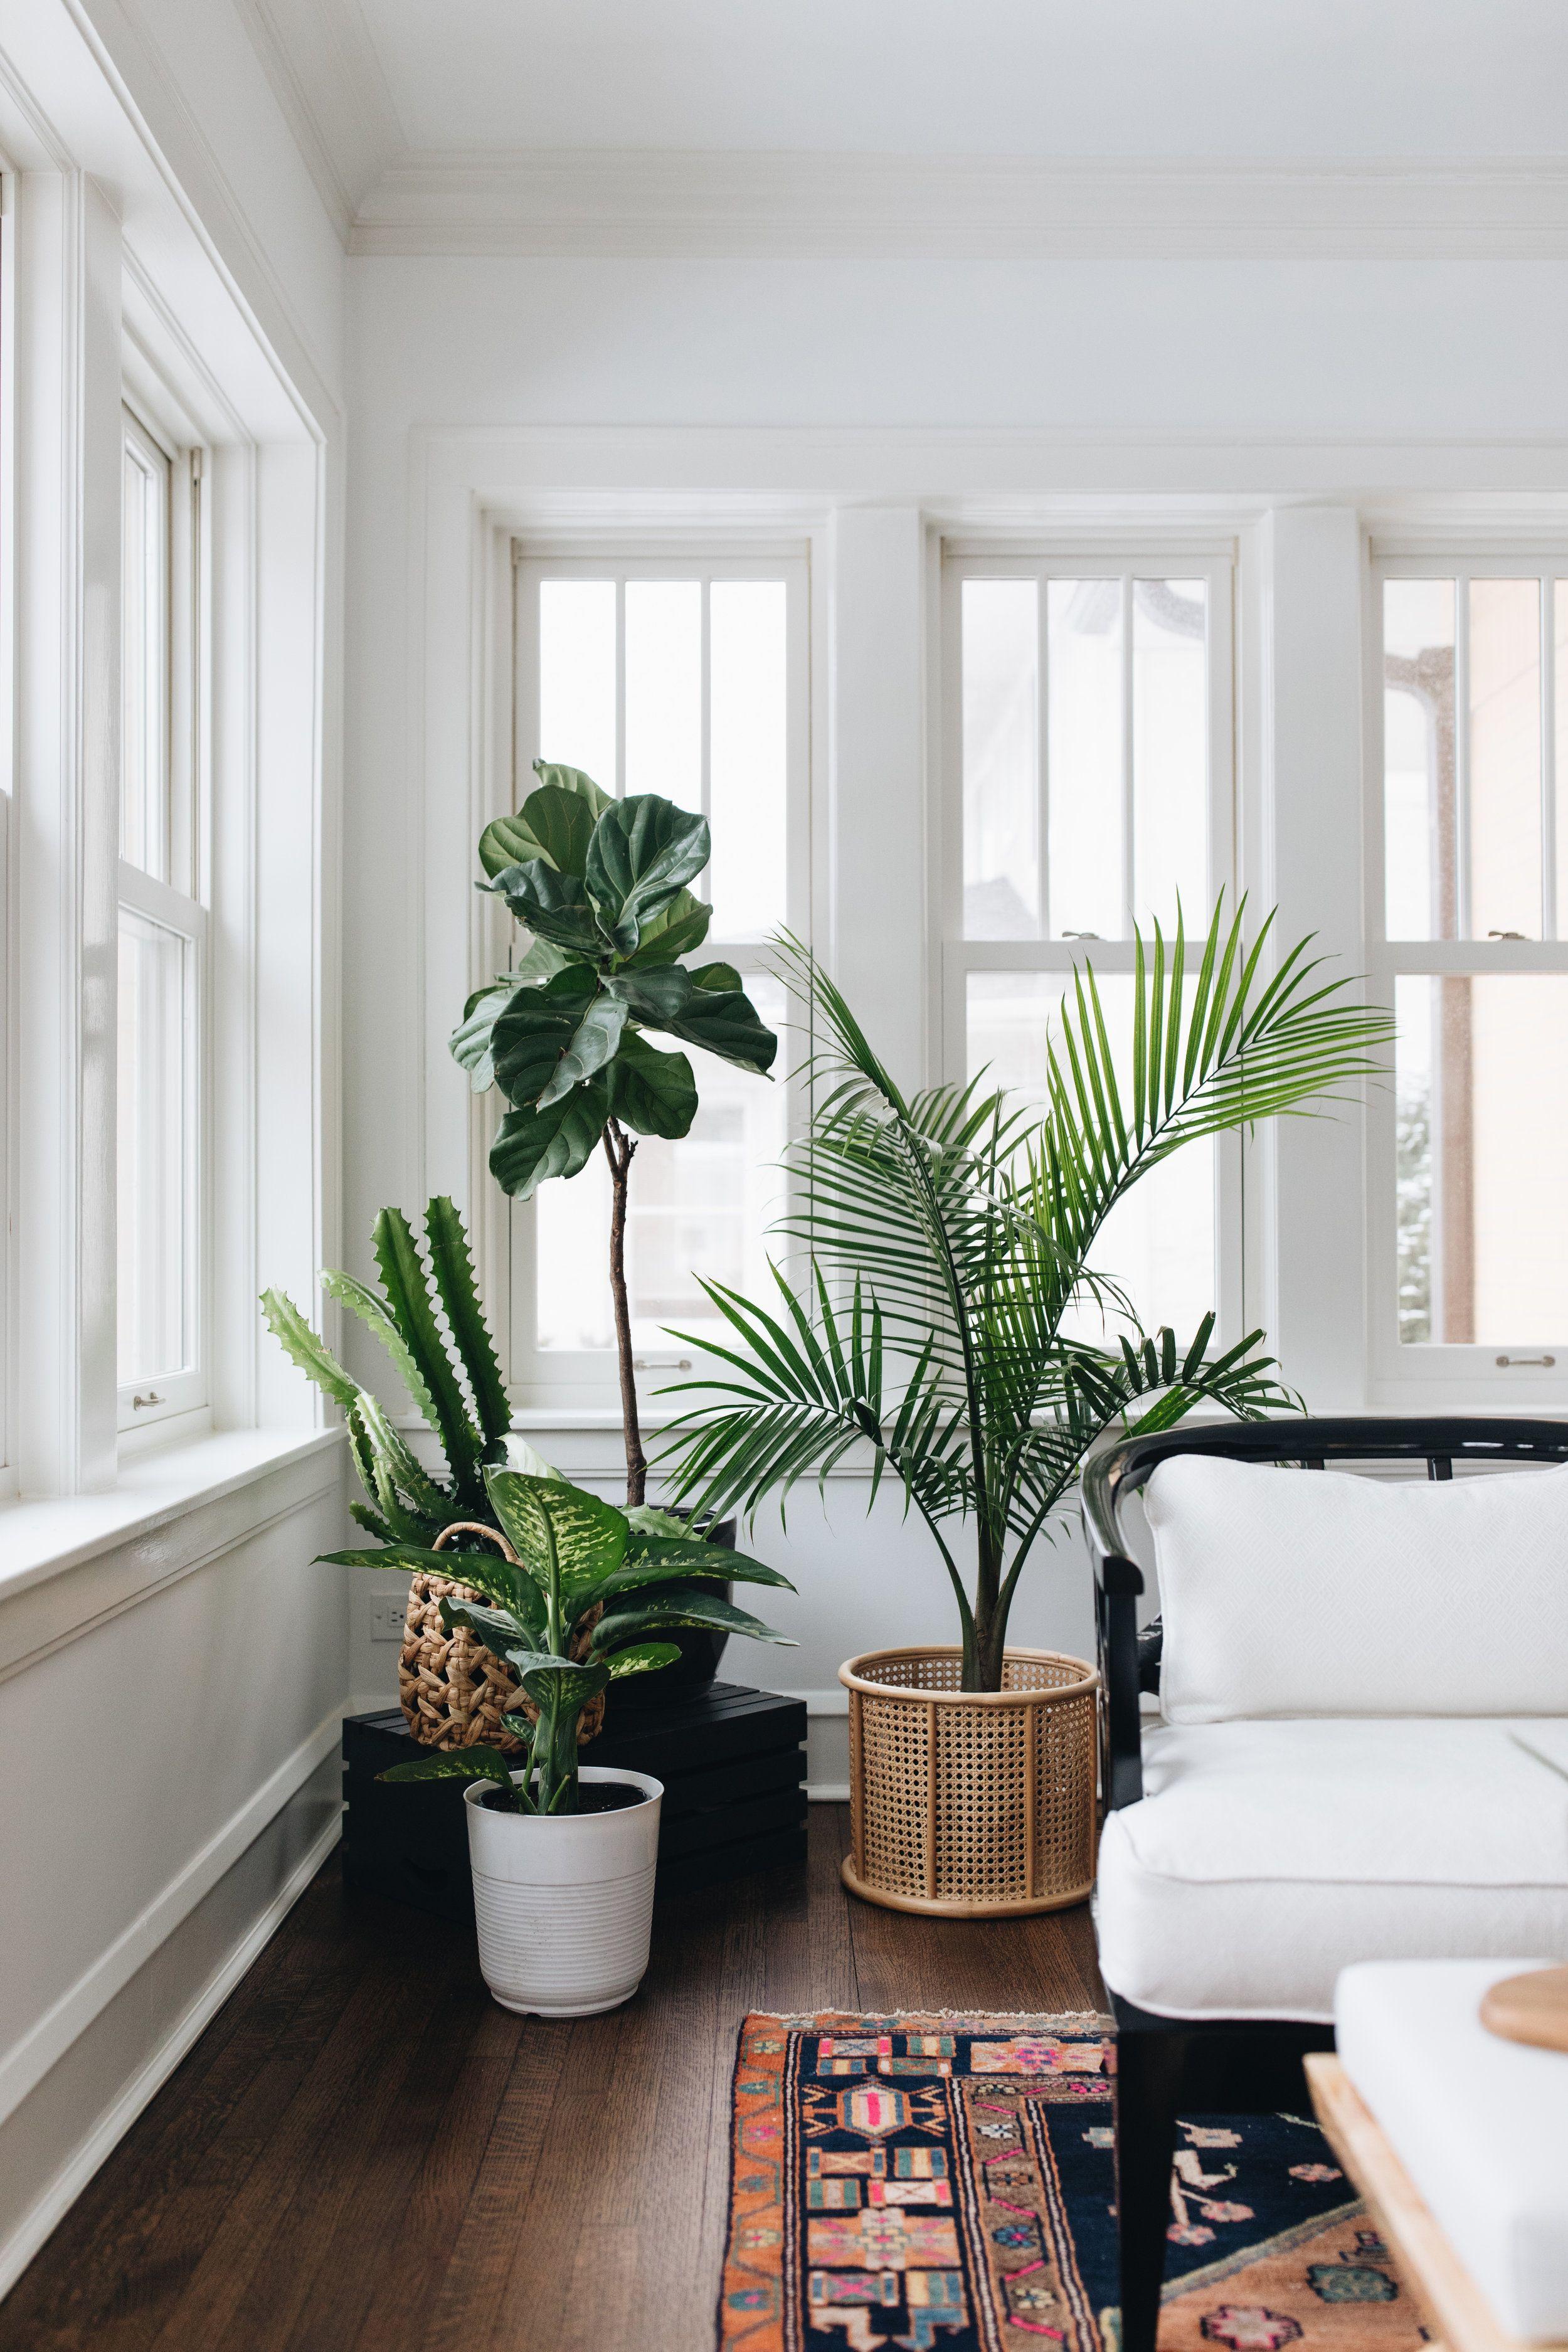 White Sunroom Green Plants Vintage Rug White Upholstery Minimalist Decor Minimalist Living Room Decor #white #minimalist #living #room